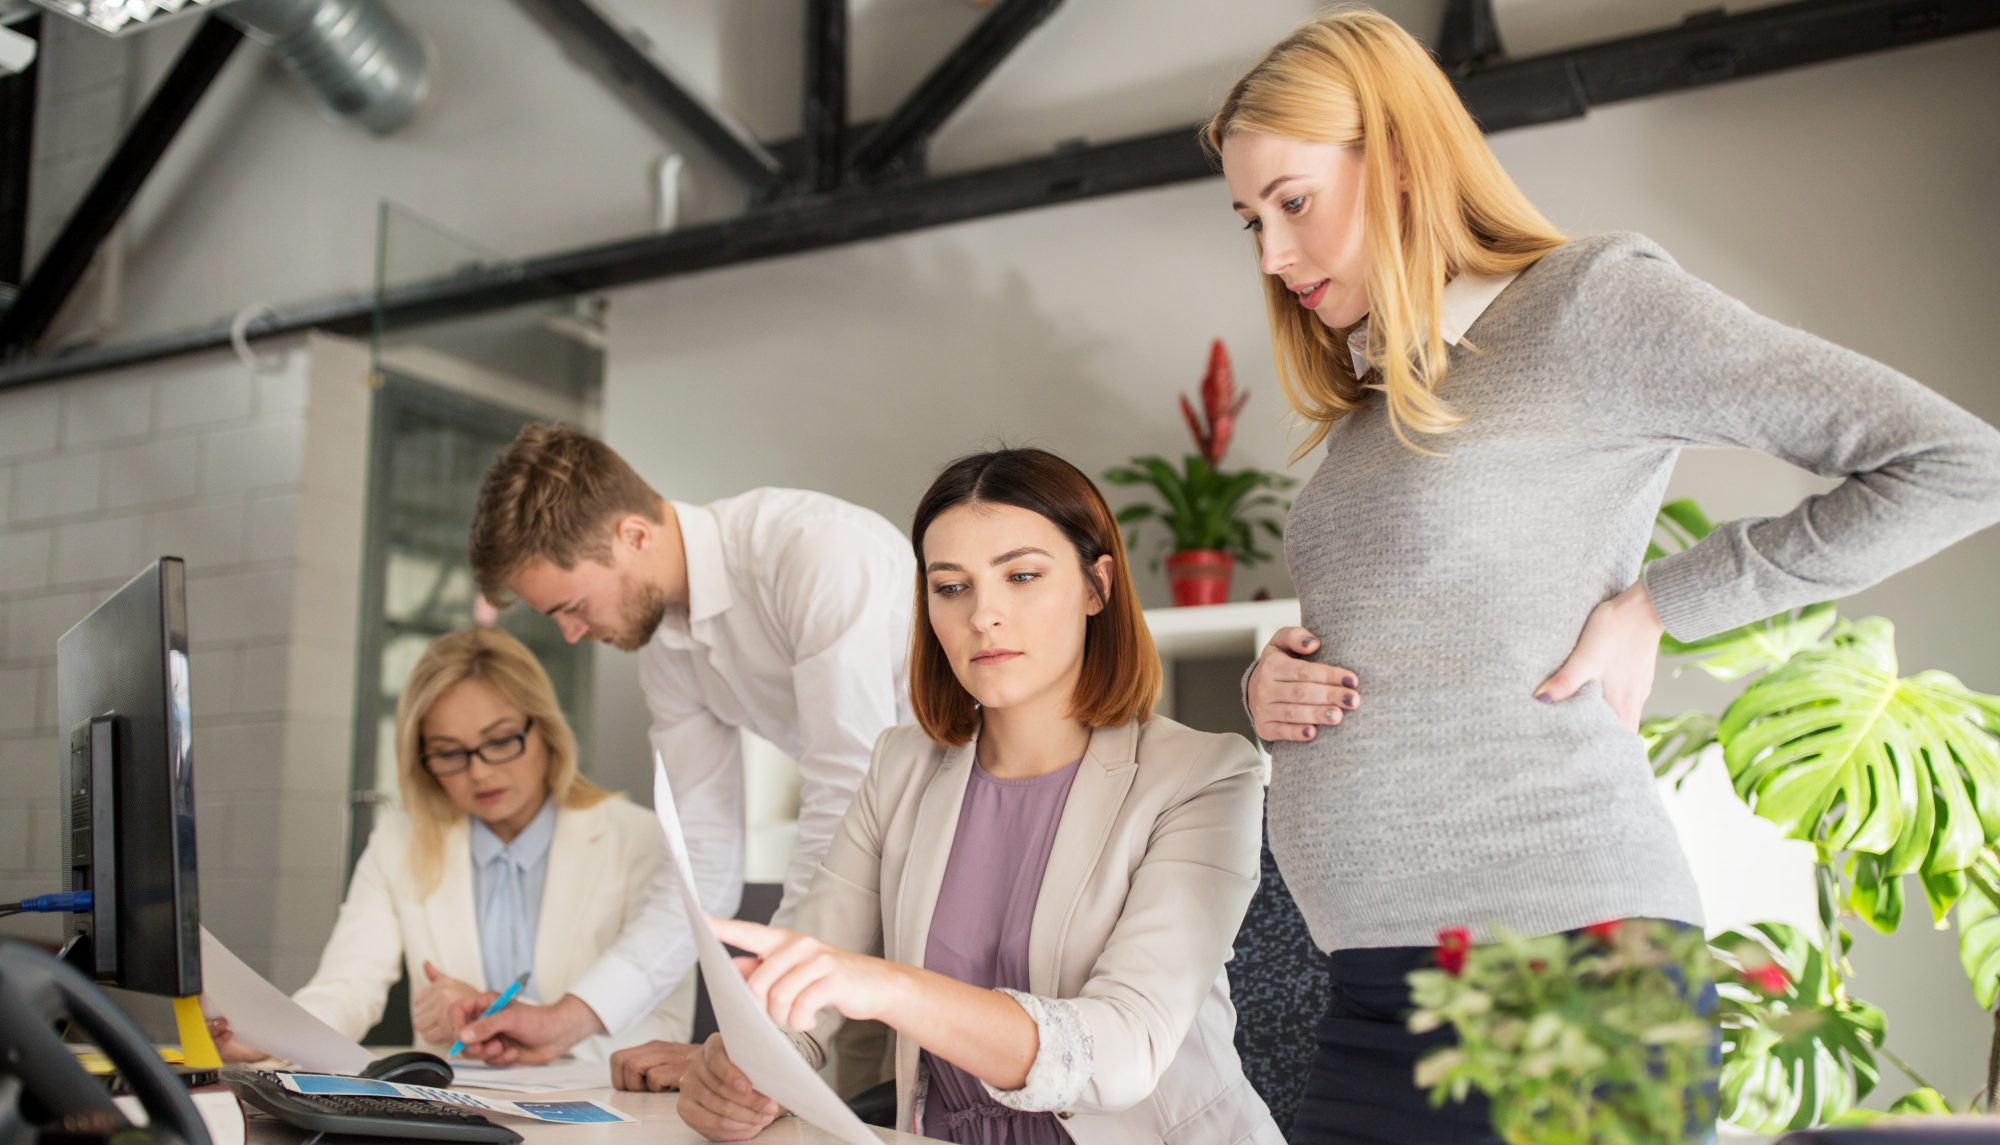 Workplace Pregnancy Discrimination